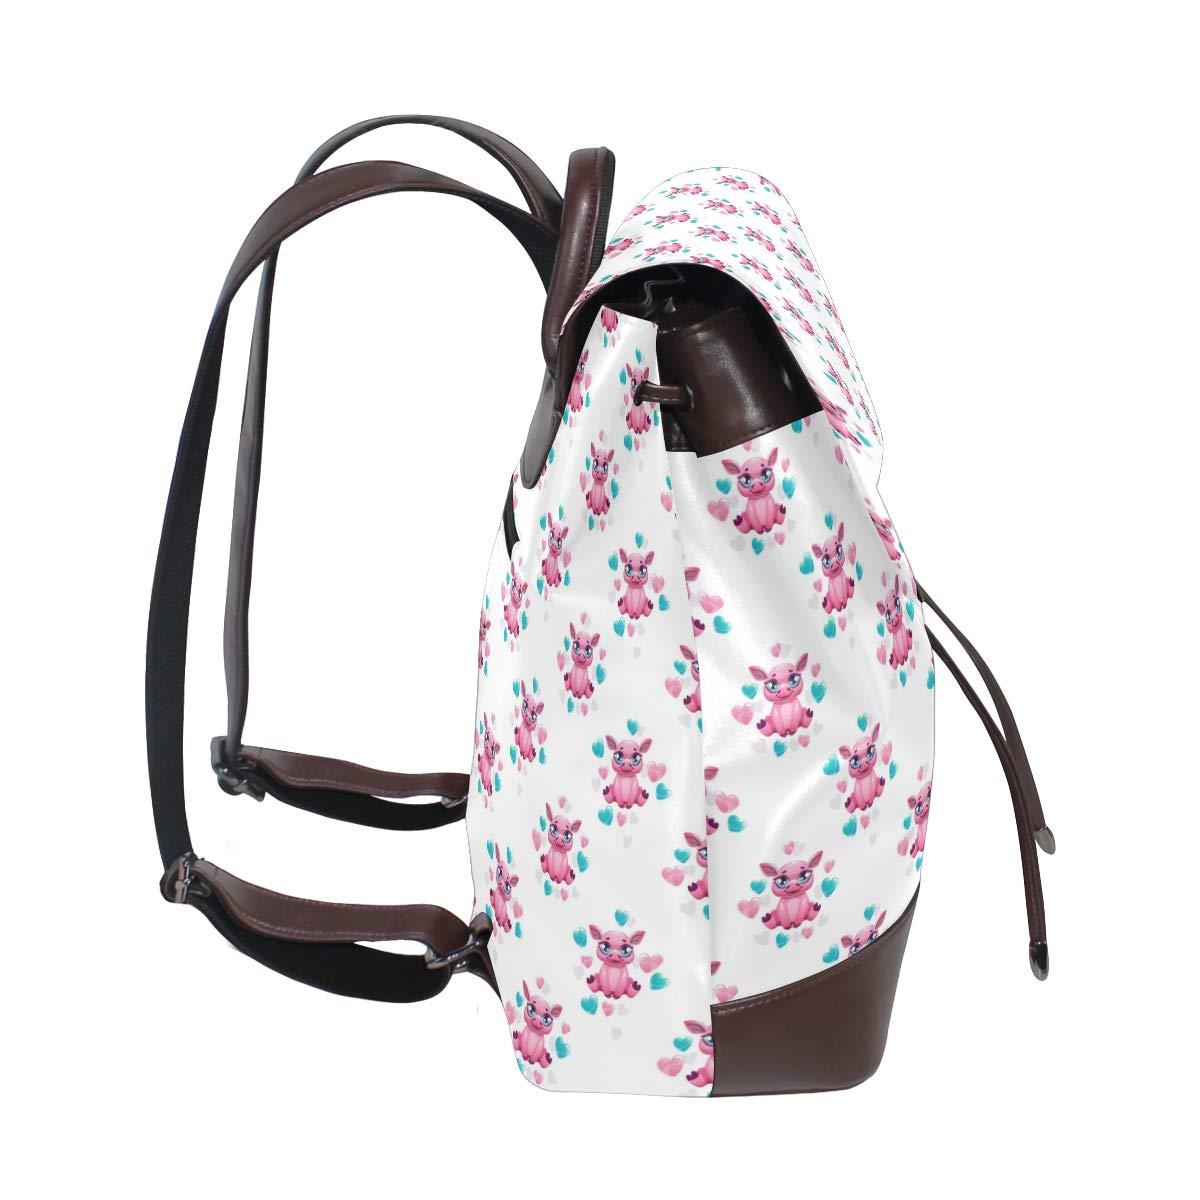 Leather Cute Cartoon Pink Pig Backpack Daypack Bag Women